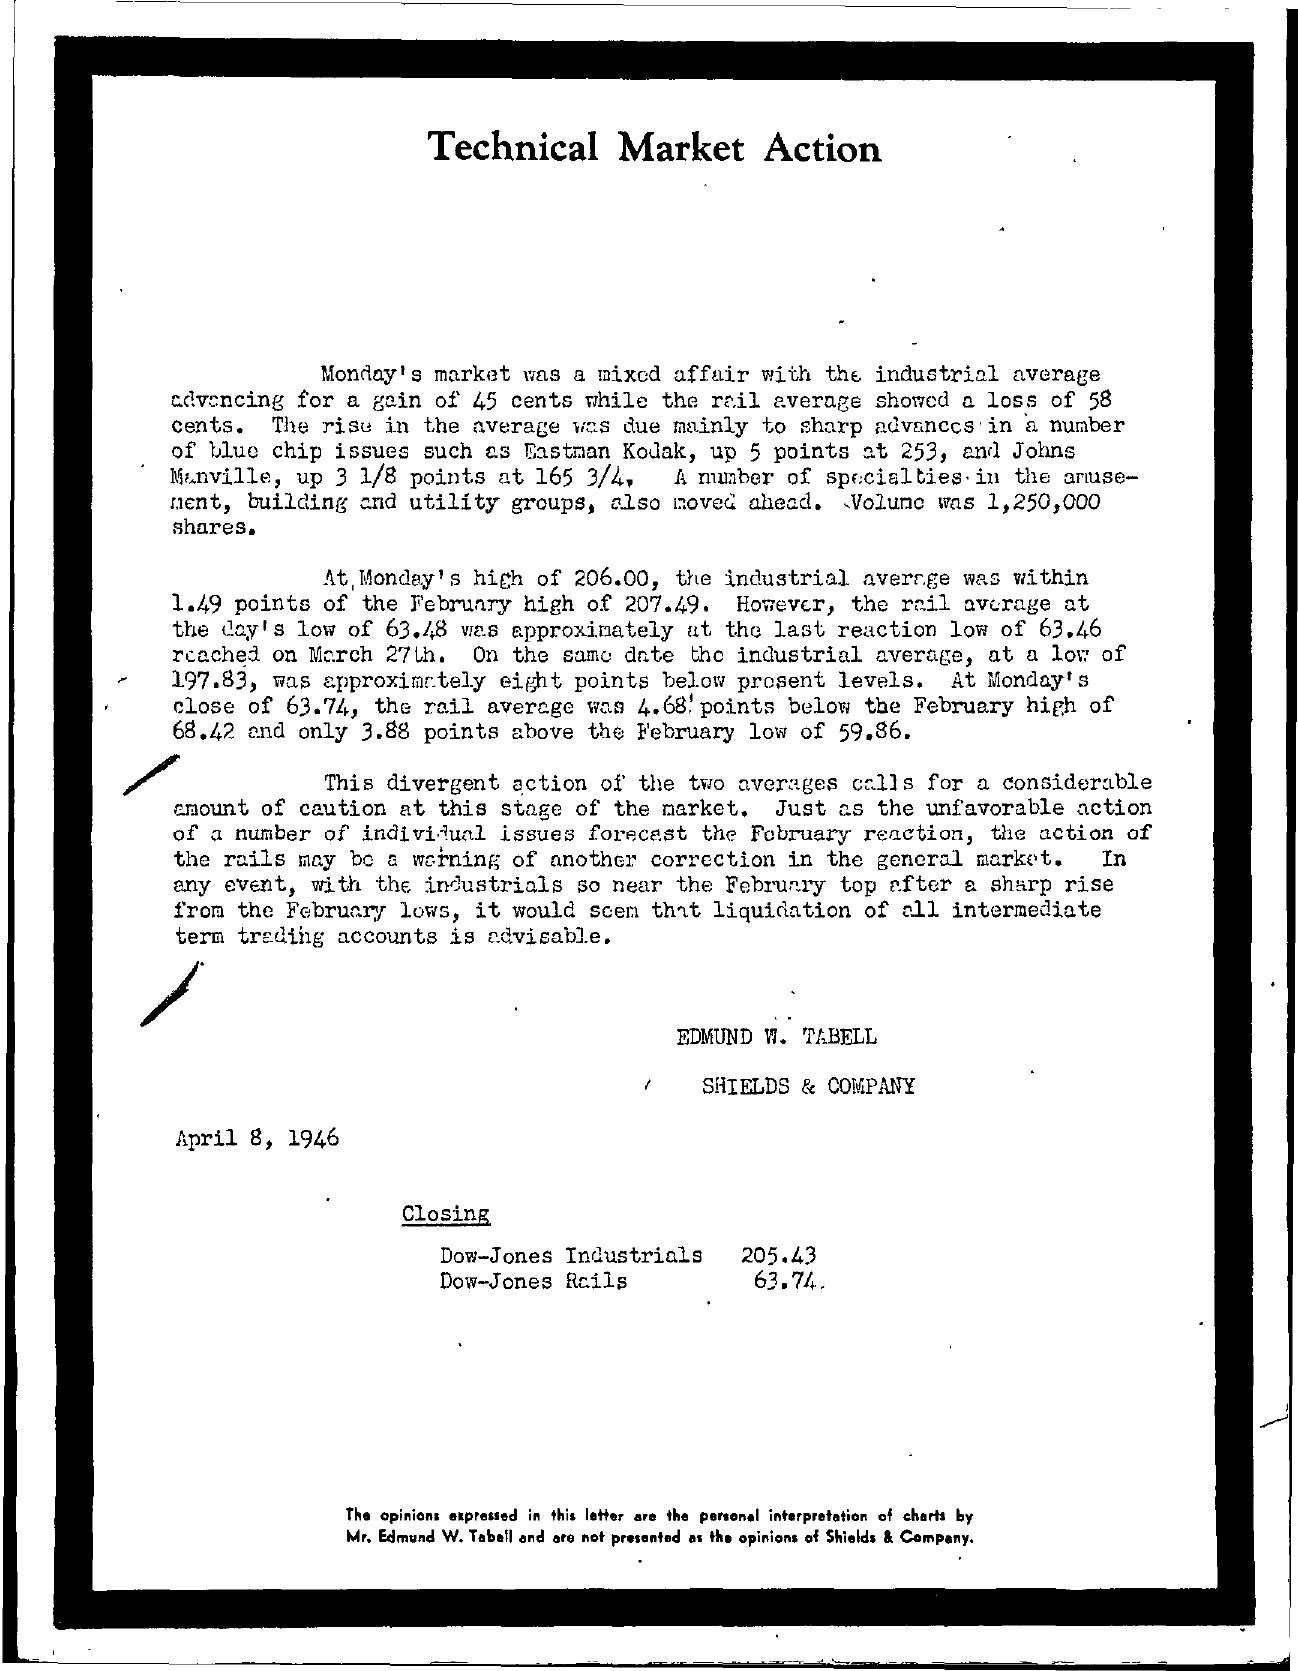 Tabell's Market Letter - April 08, 1946